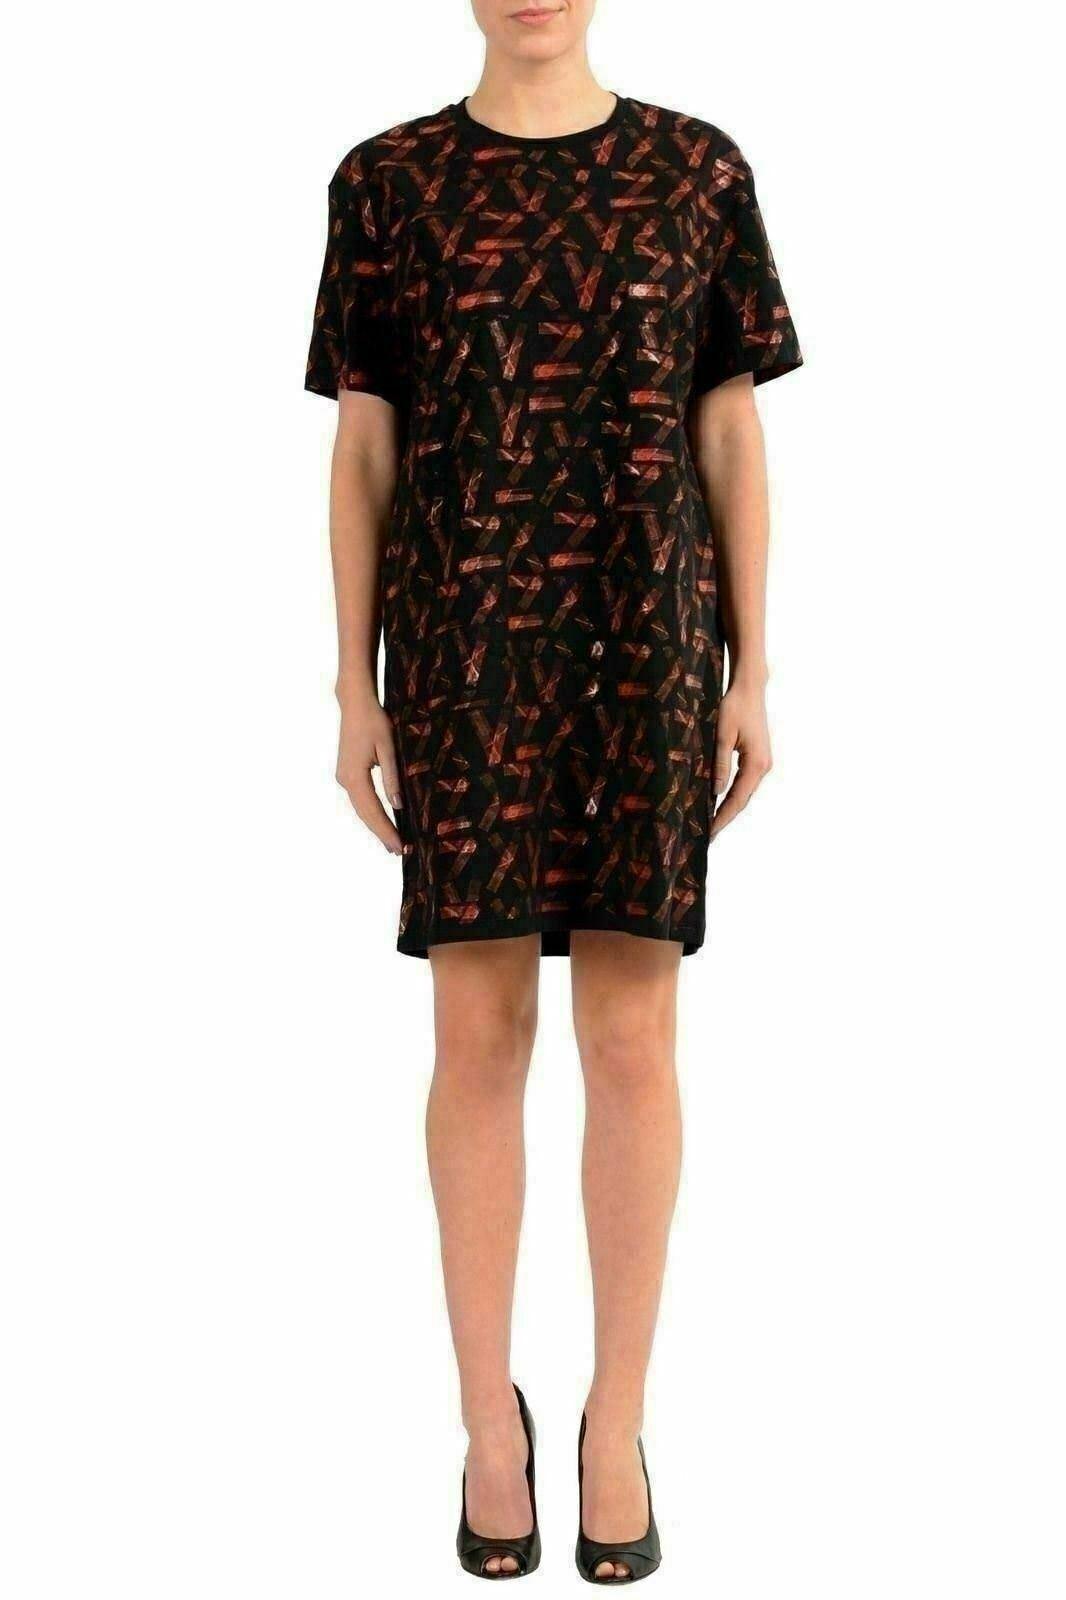 Versace Versus Mehrfarbig Kurzärmlig Damen Hemd Kleid Us XS es 38